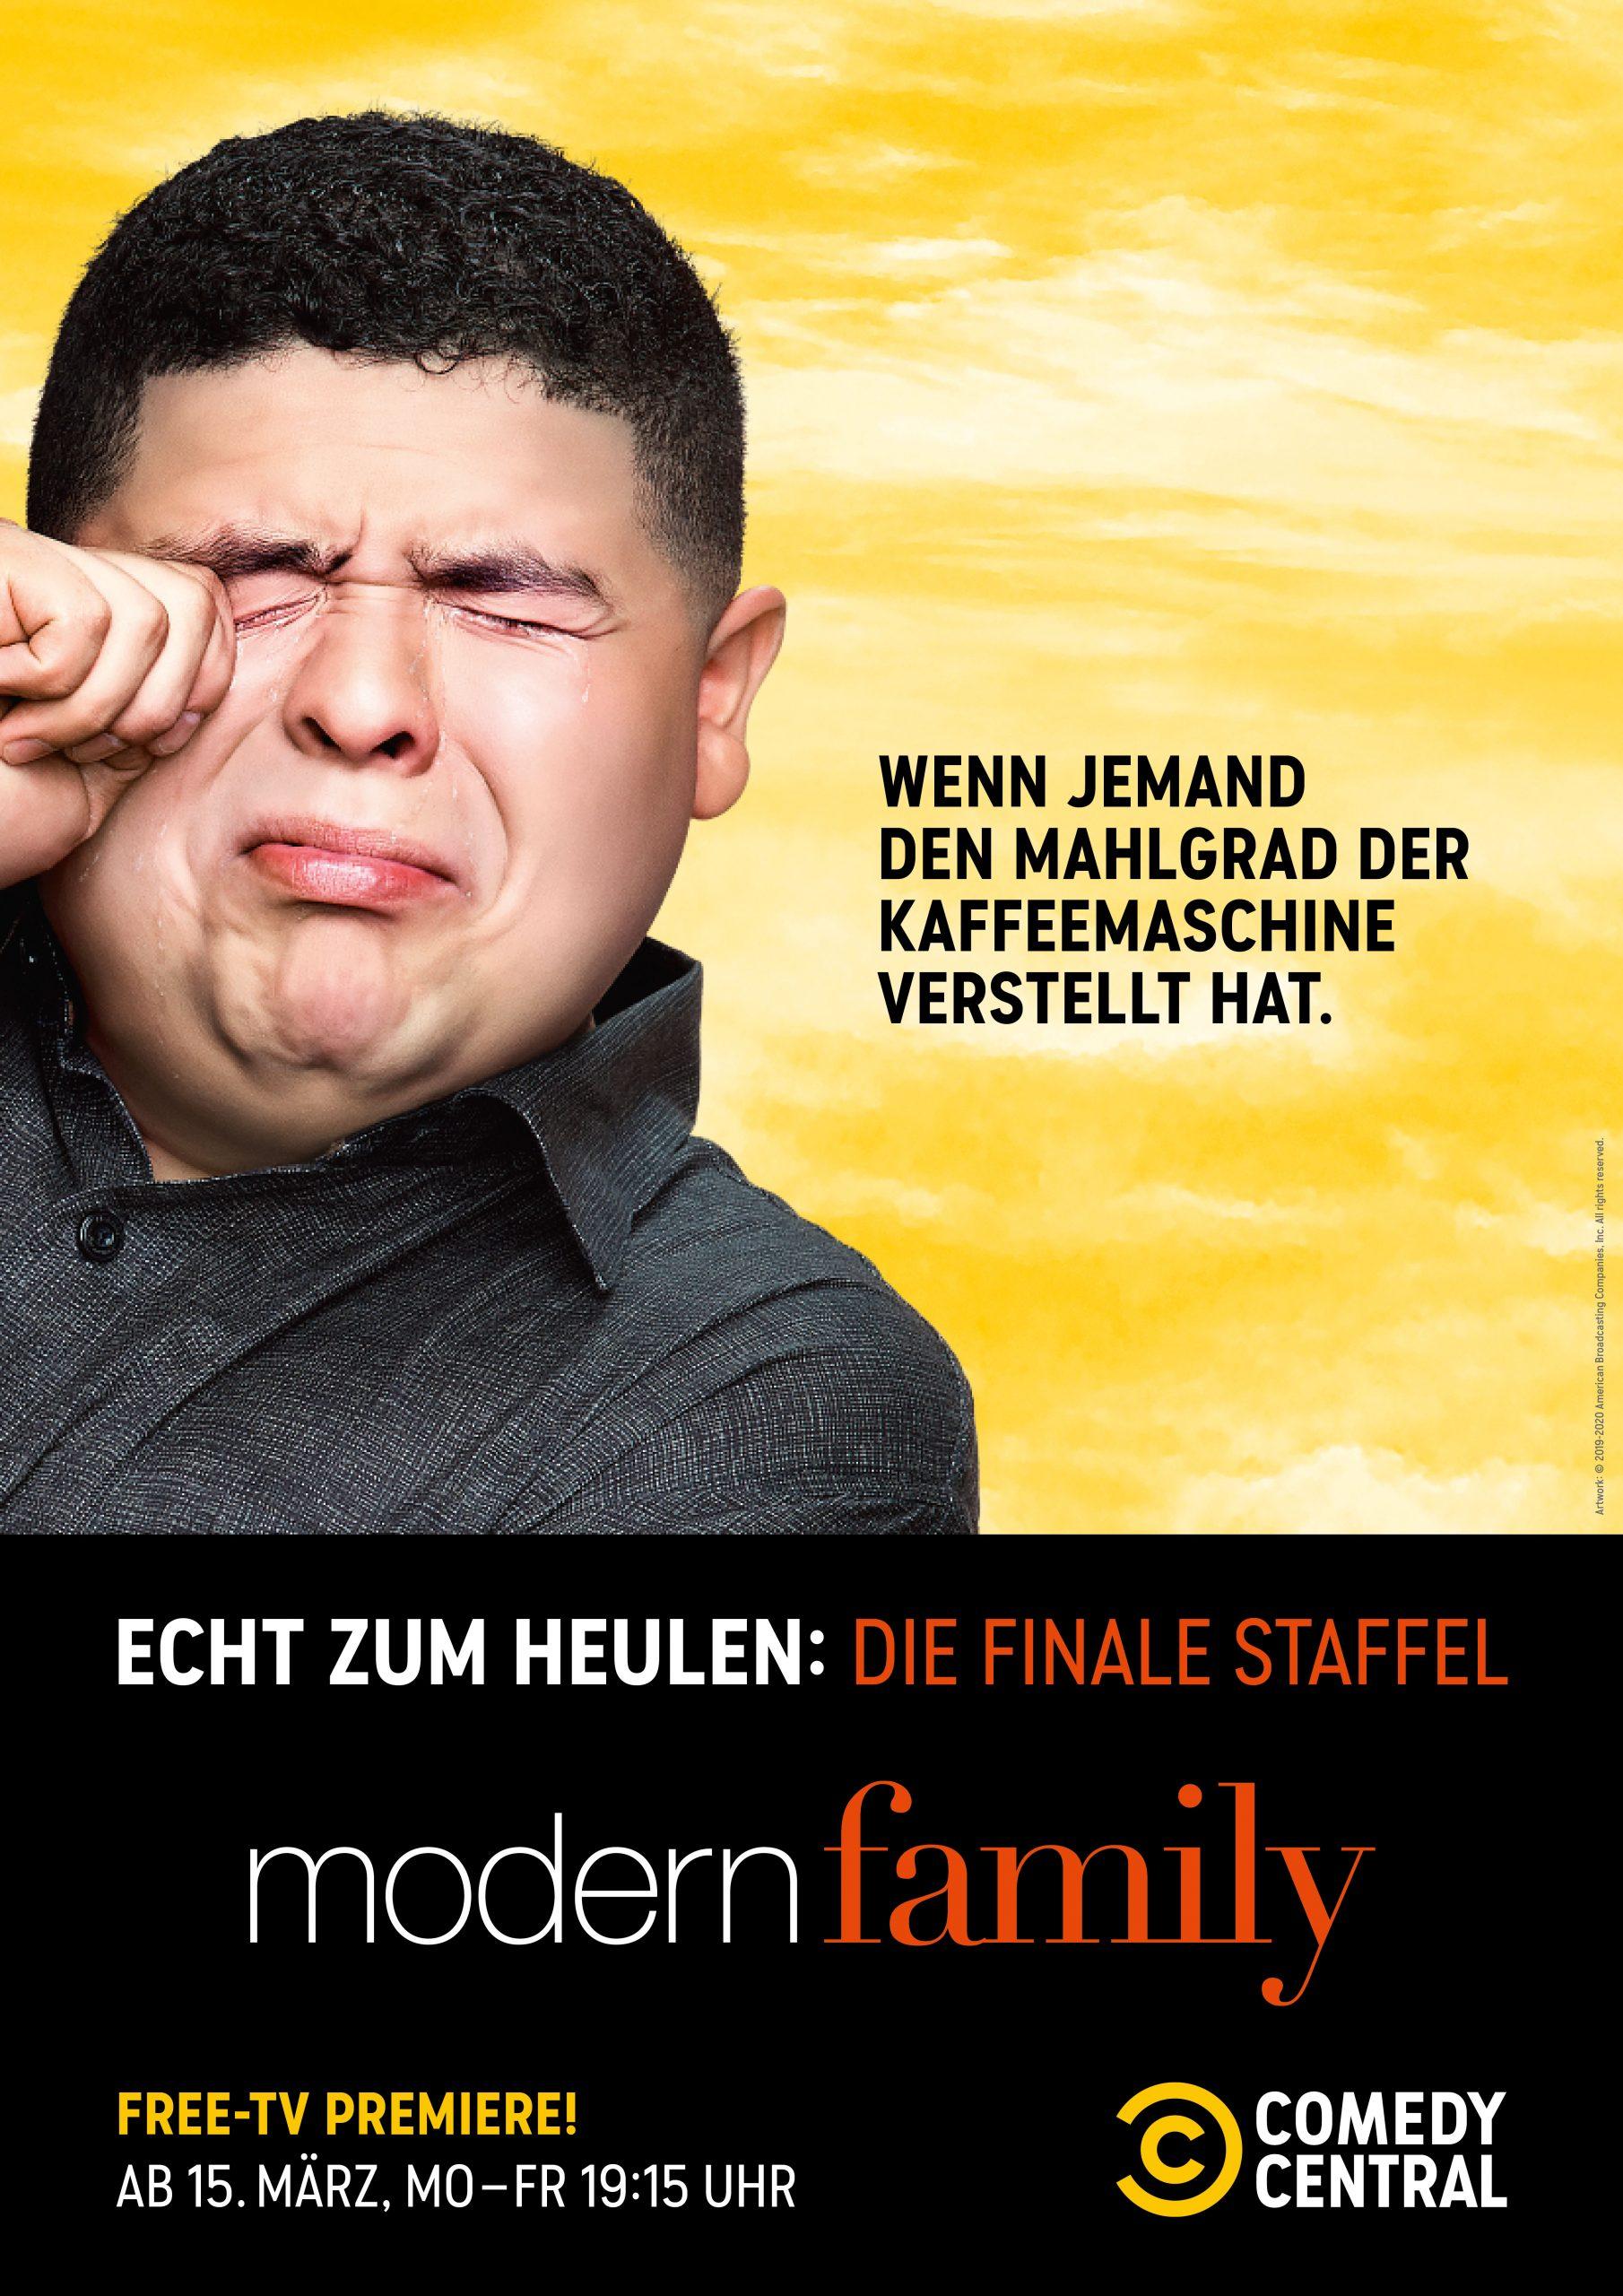 210210_CC_Modern_Family_MasterLayouts_Hochformat6